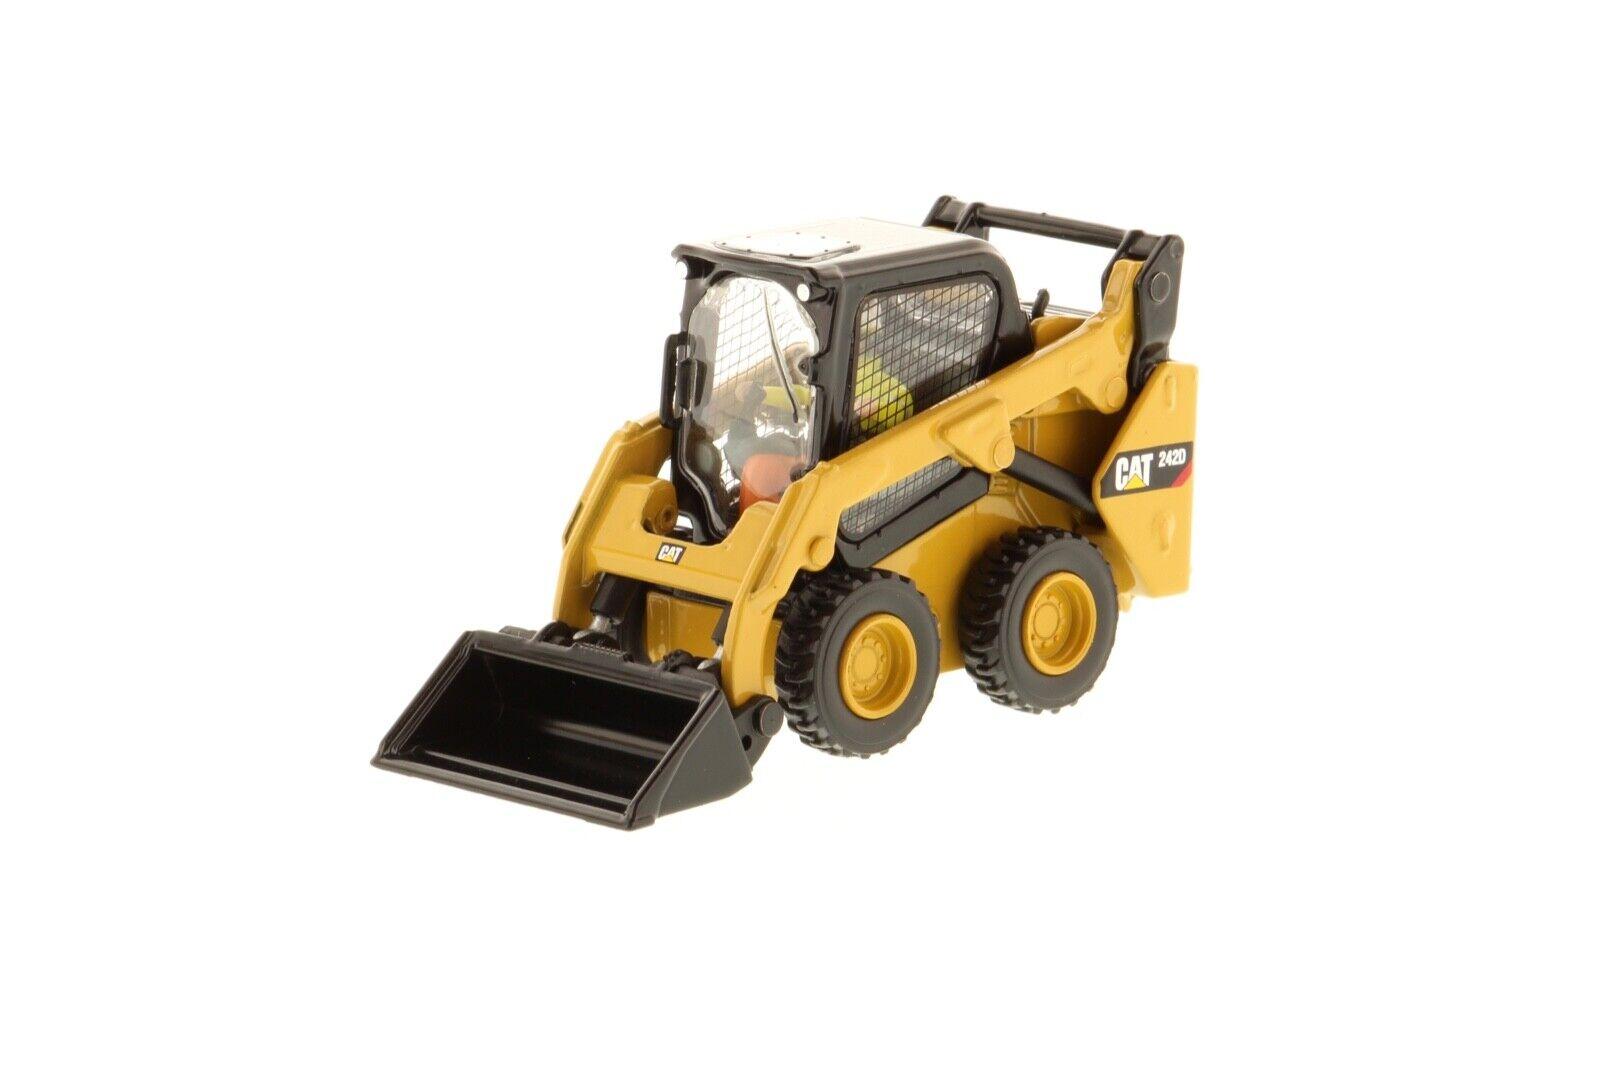 a la venta Cat Caterpillar Skid Skid Skid Steer Cochegador 242D escala 1 50 85525 Diecast Masters  edición limitada